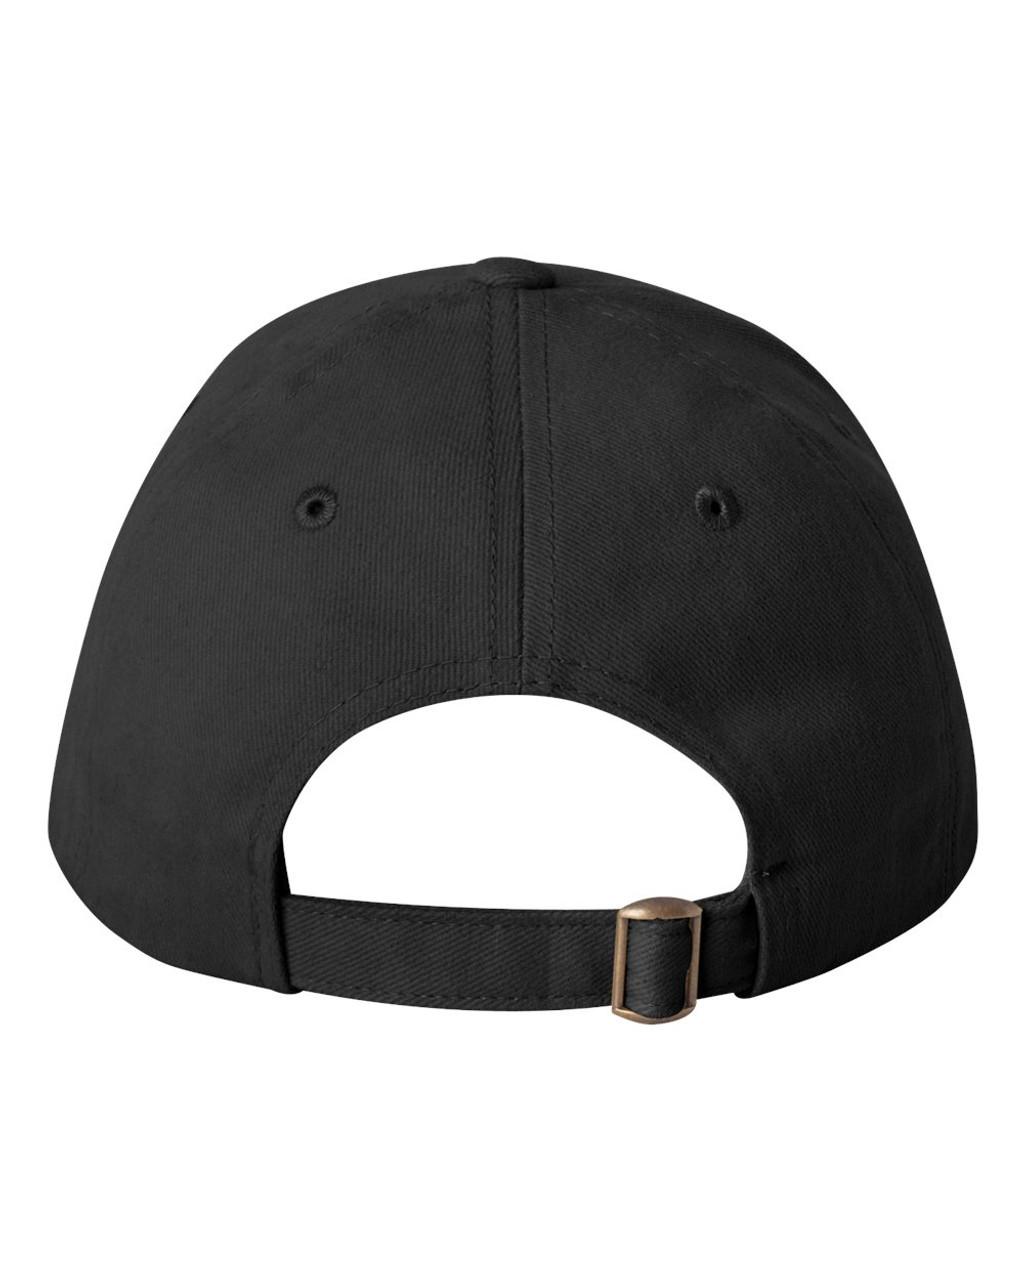 SP9910 Sportsman Brushed Structured Hat   T-shirt.ca